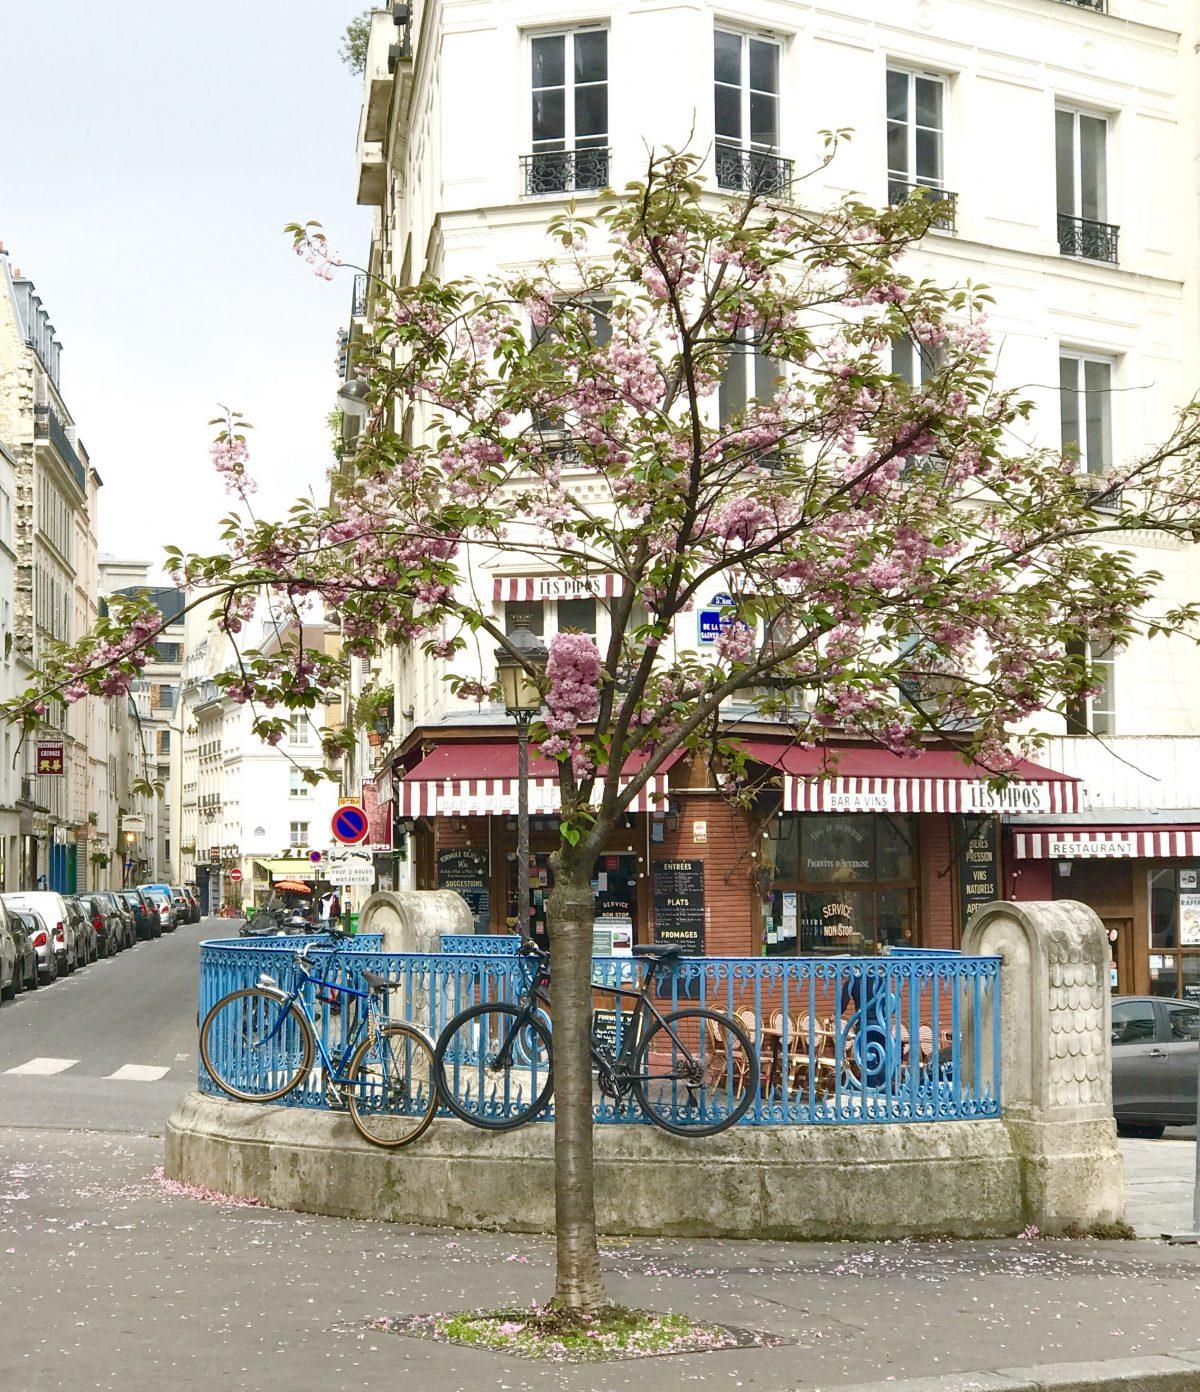 Spaziergang durch Montmartre   Berlinmittemom.com